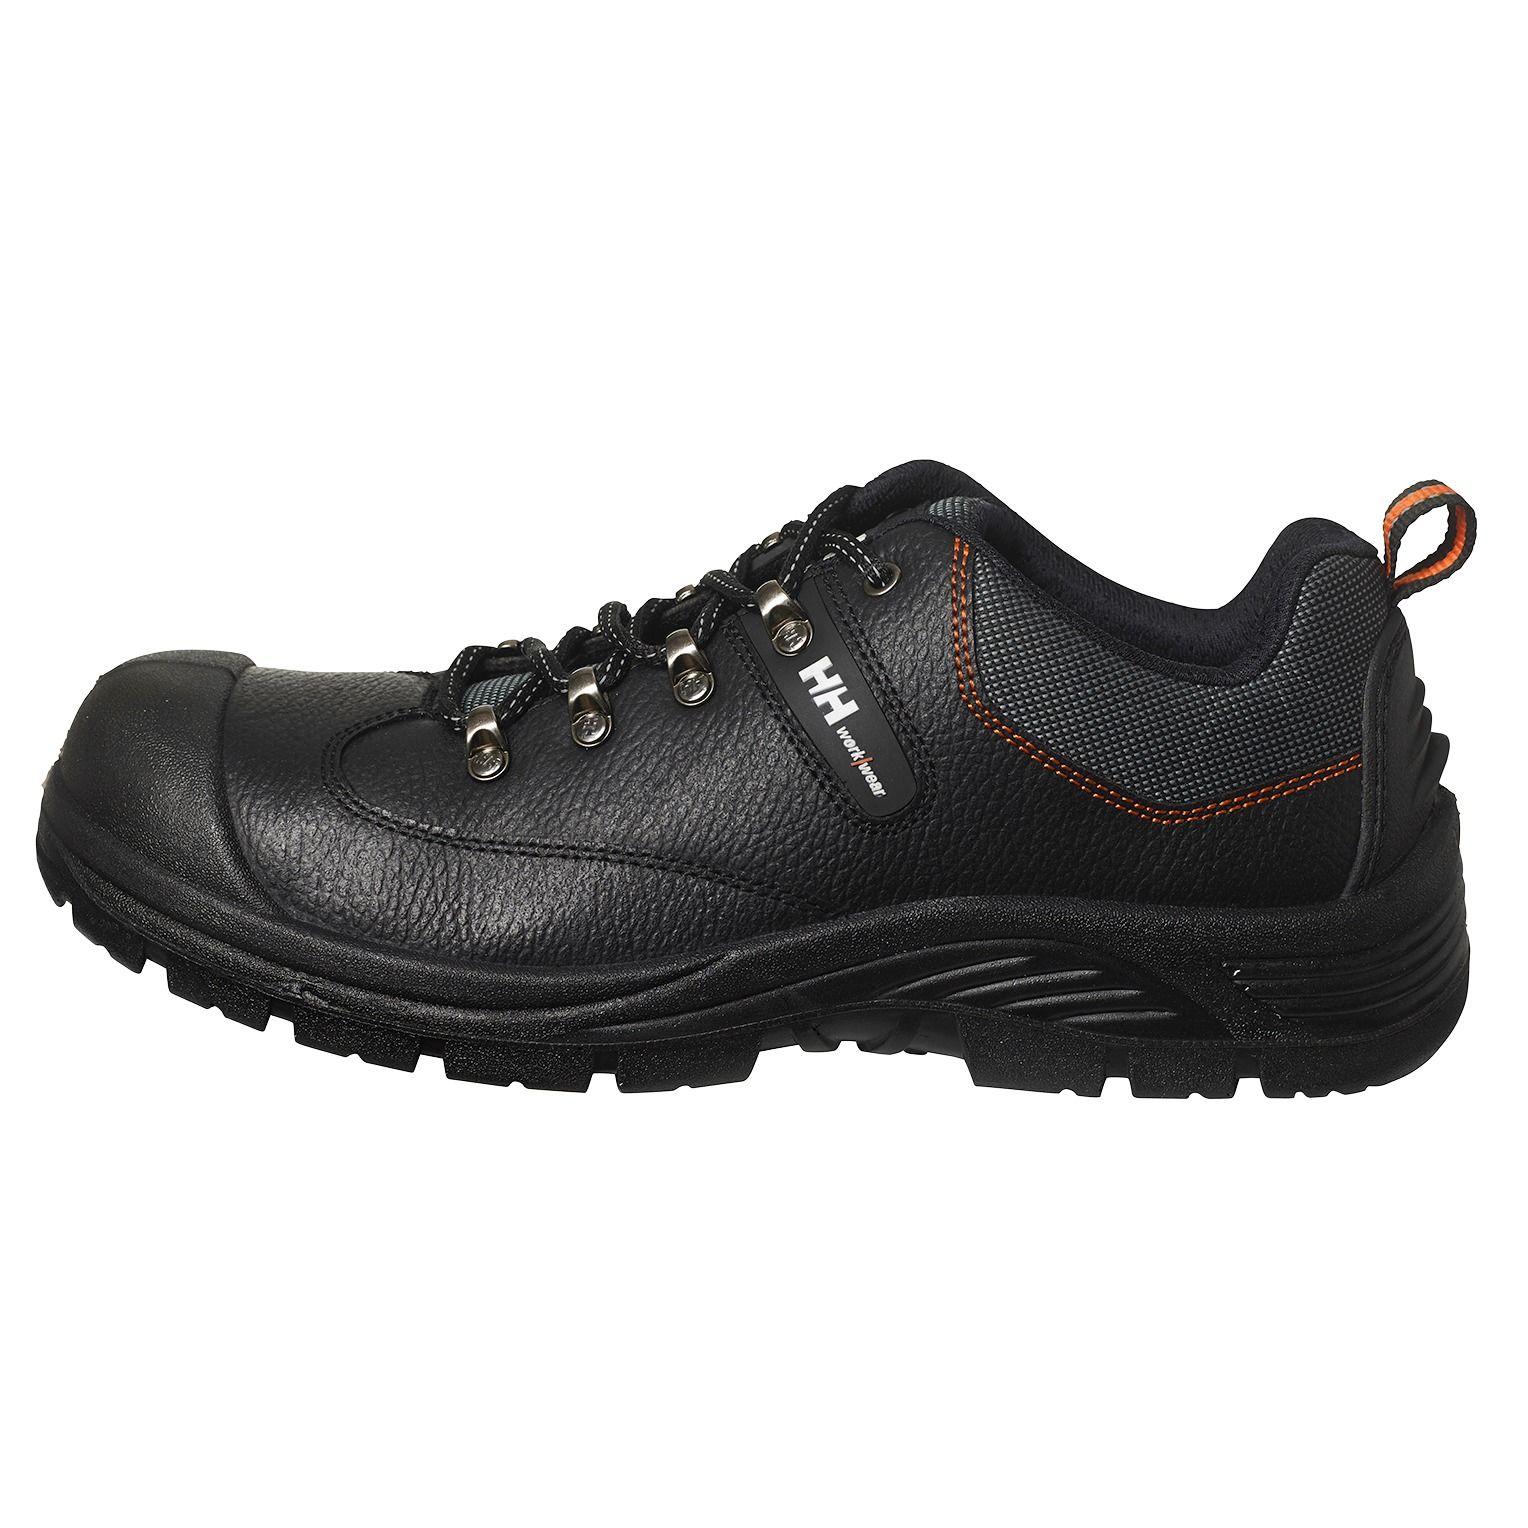 f5d00d88e03 Zapatos de seguridad con puntera plástica | Comprar zapatos de seguridad  online | Calzado de Protección